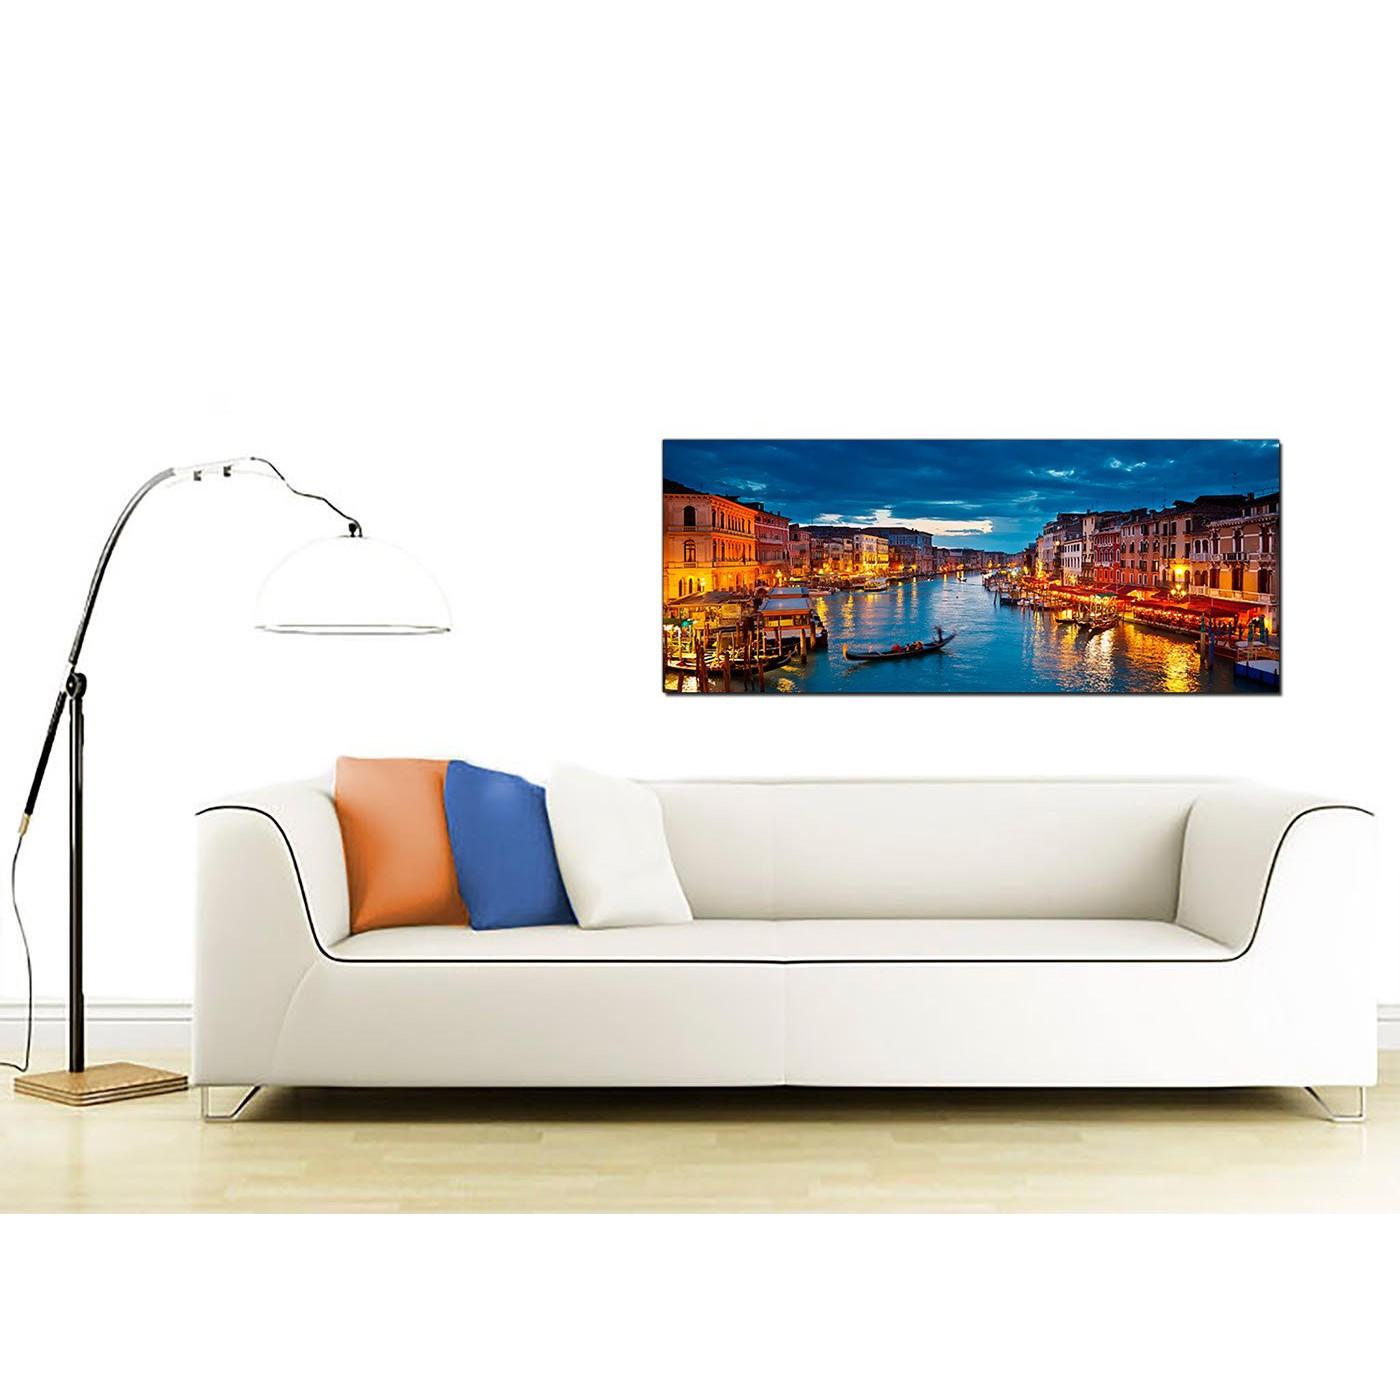 Living Room Canvas Art Part - 32: Back Display Gallery Item 1 ...